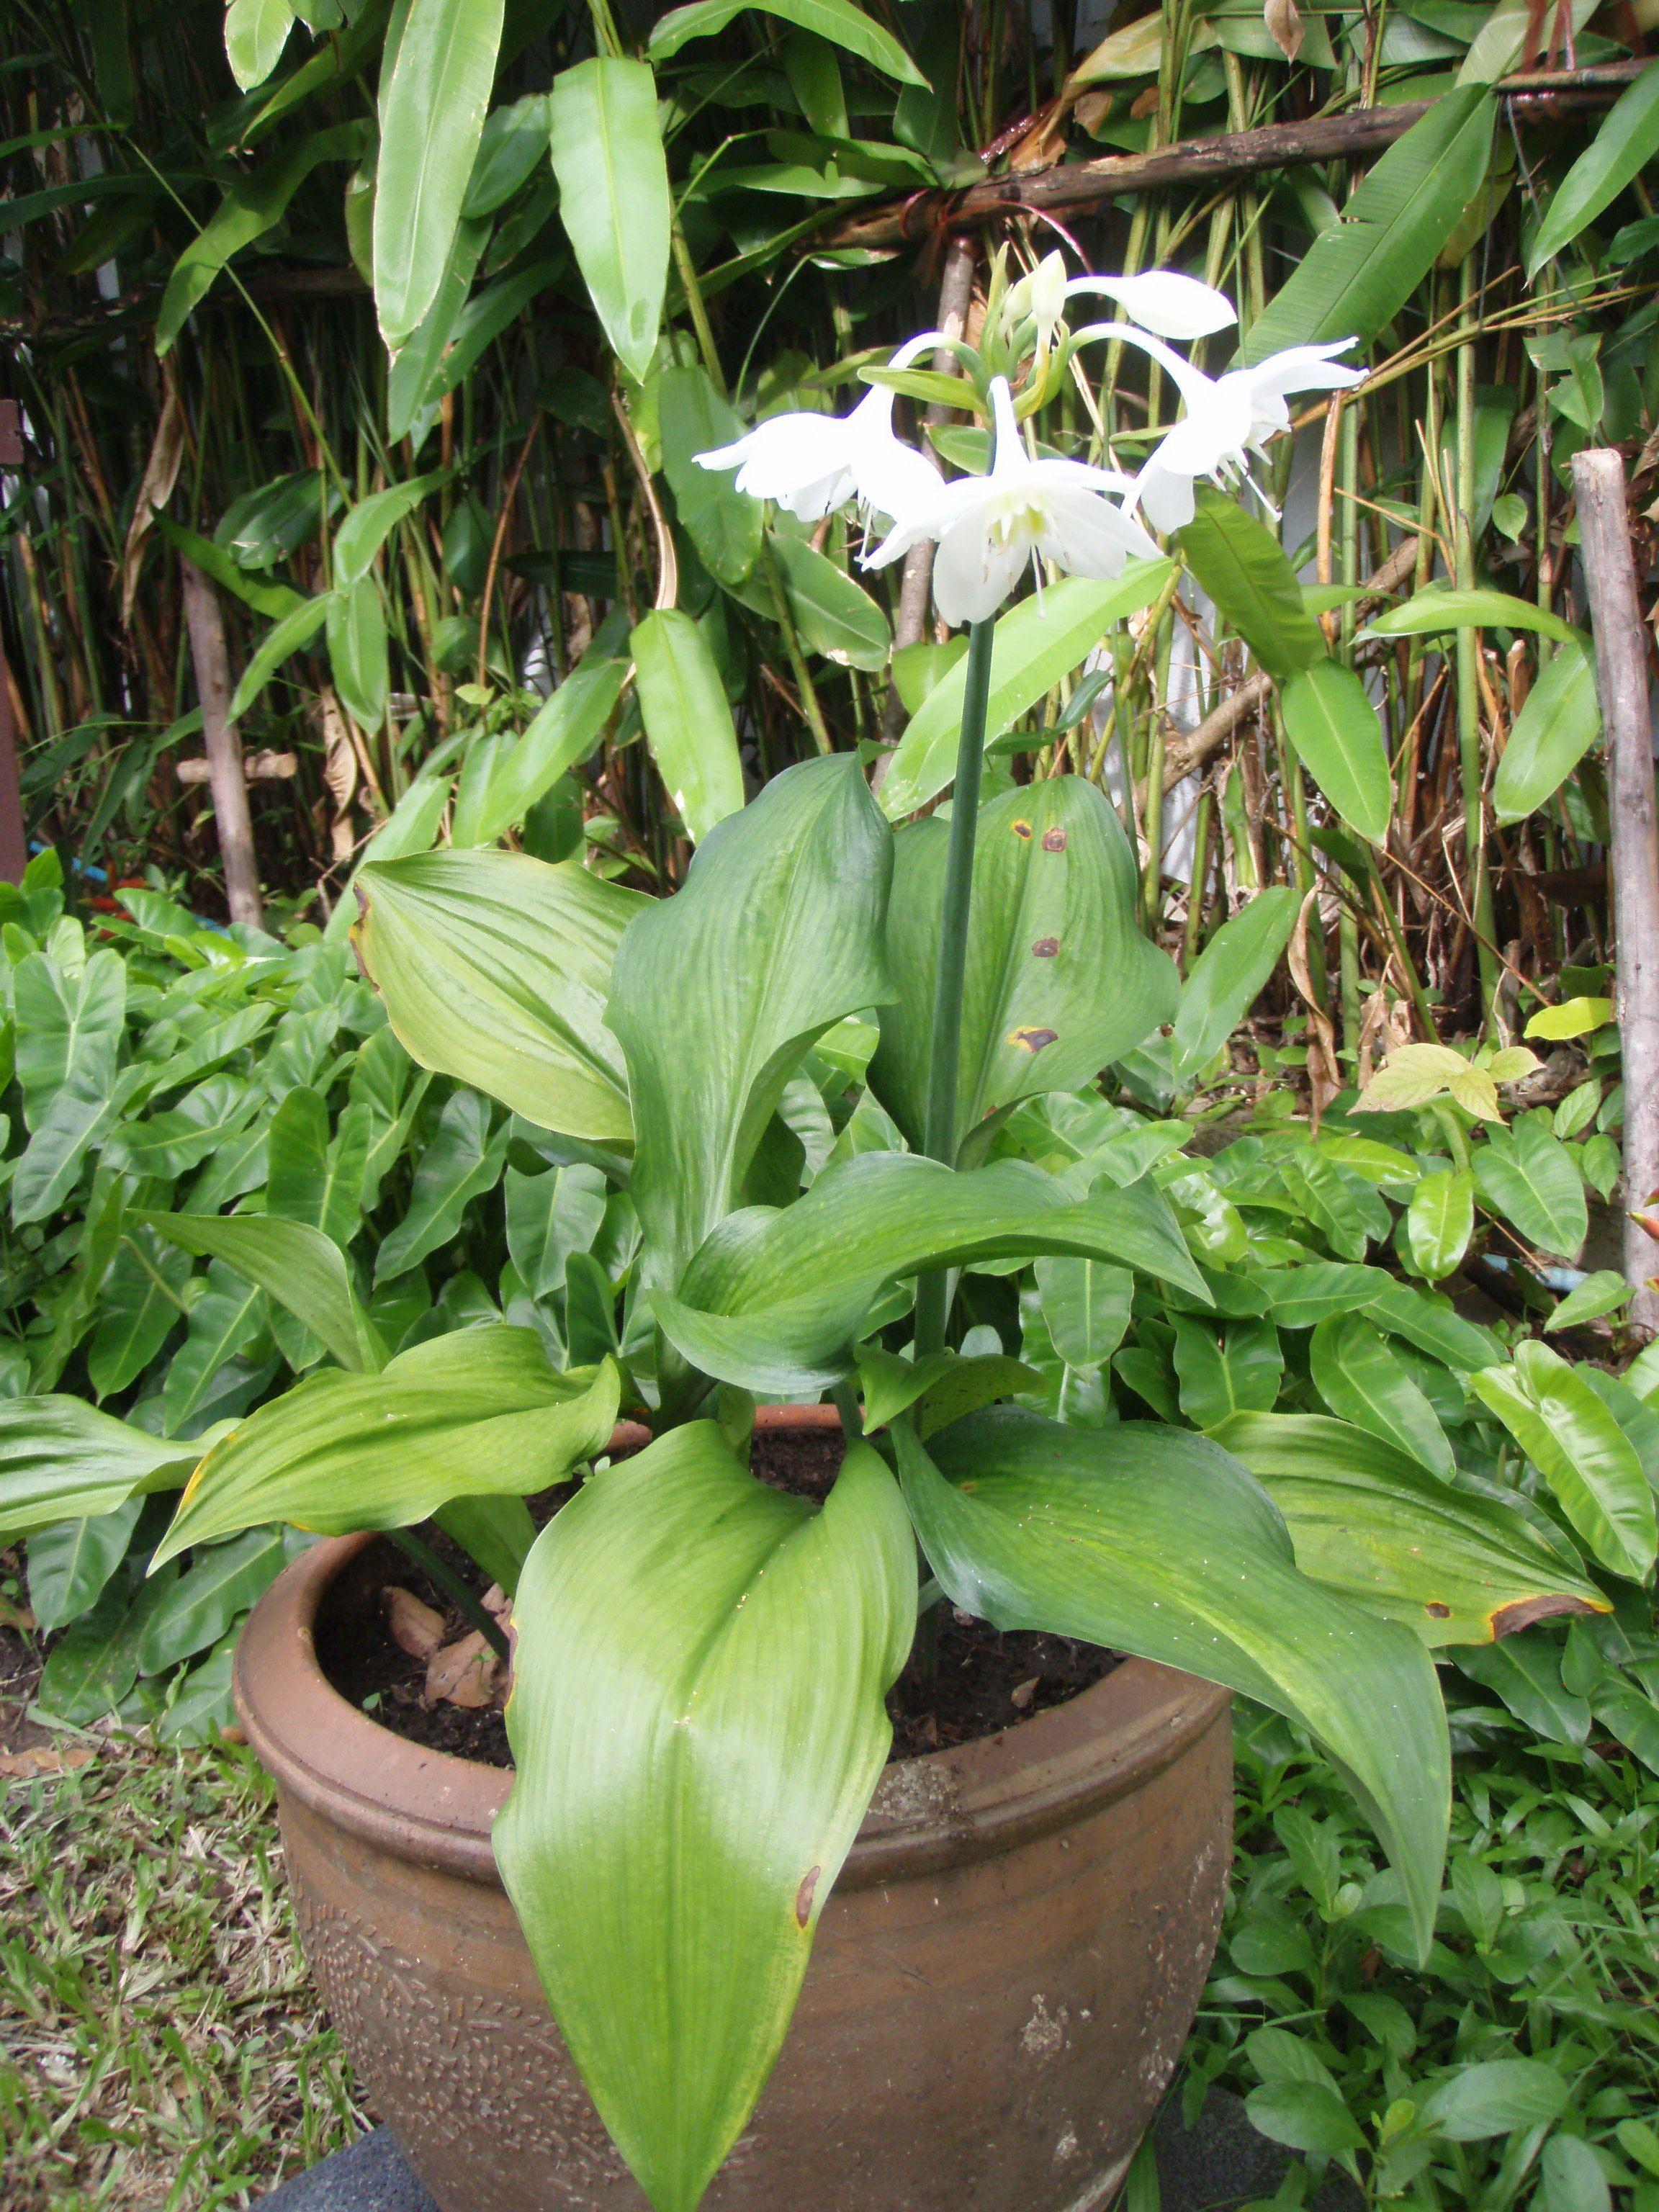 Mahachok Lovely Tropical Bulb Plants In Thailand With Fragrant